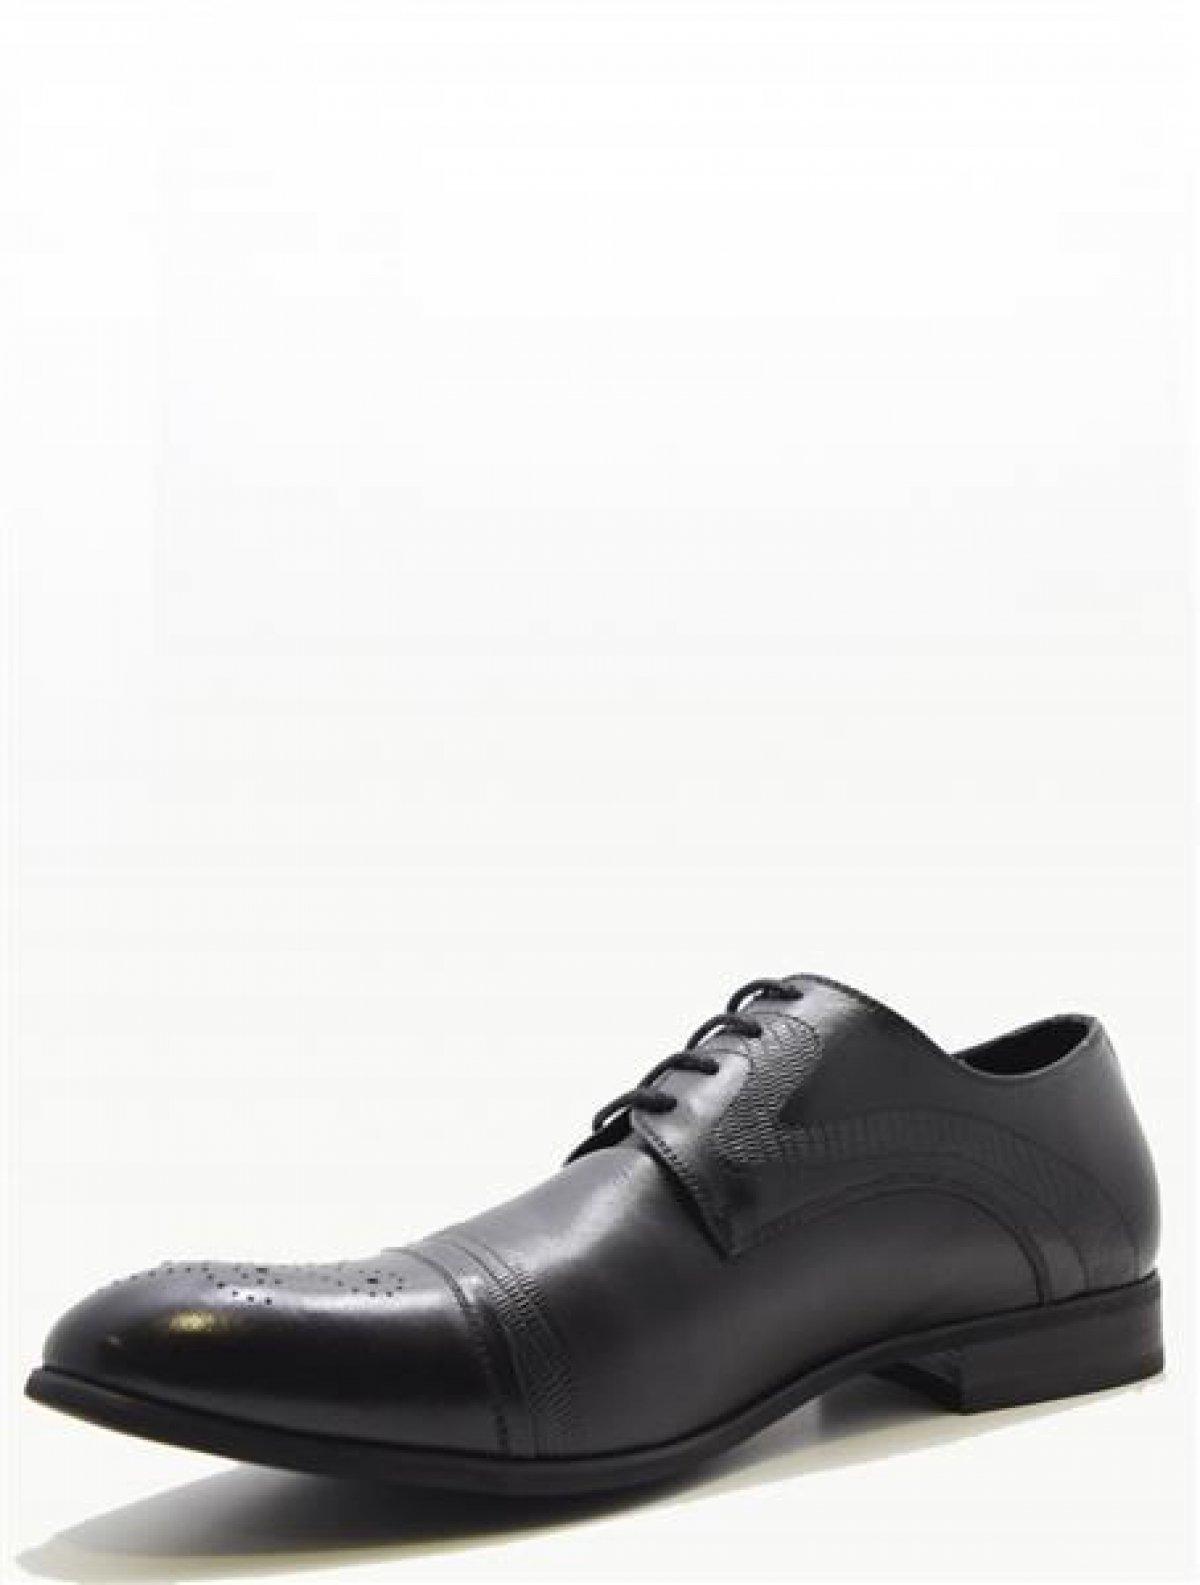 Baden R002-030 мужские туфли